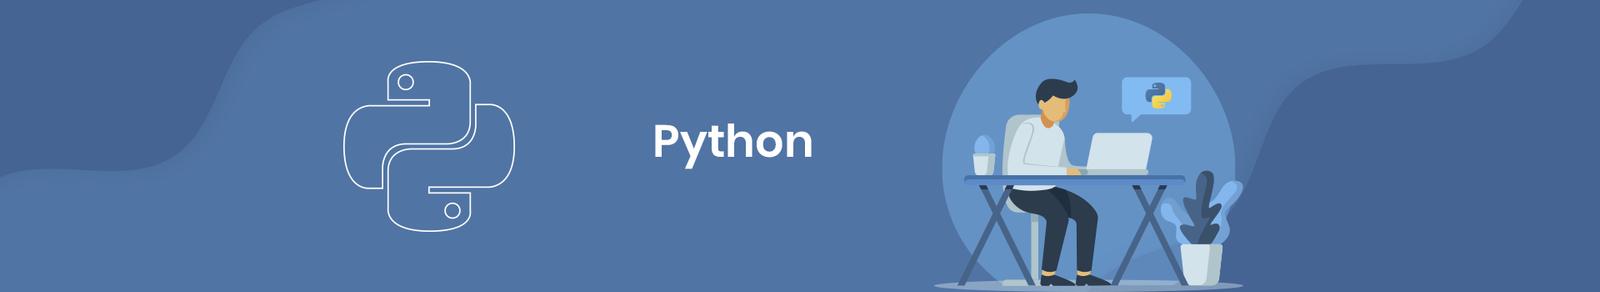 Python Desktop Banner